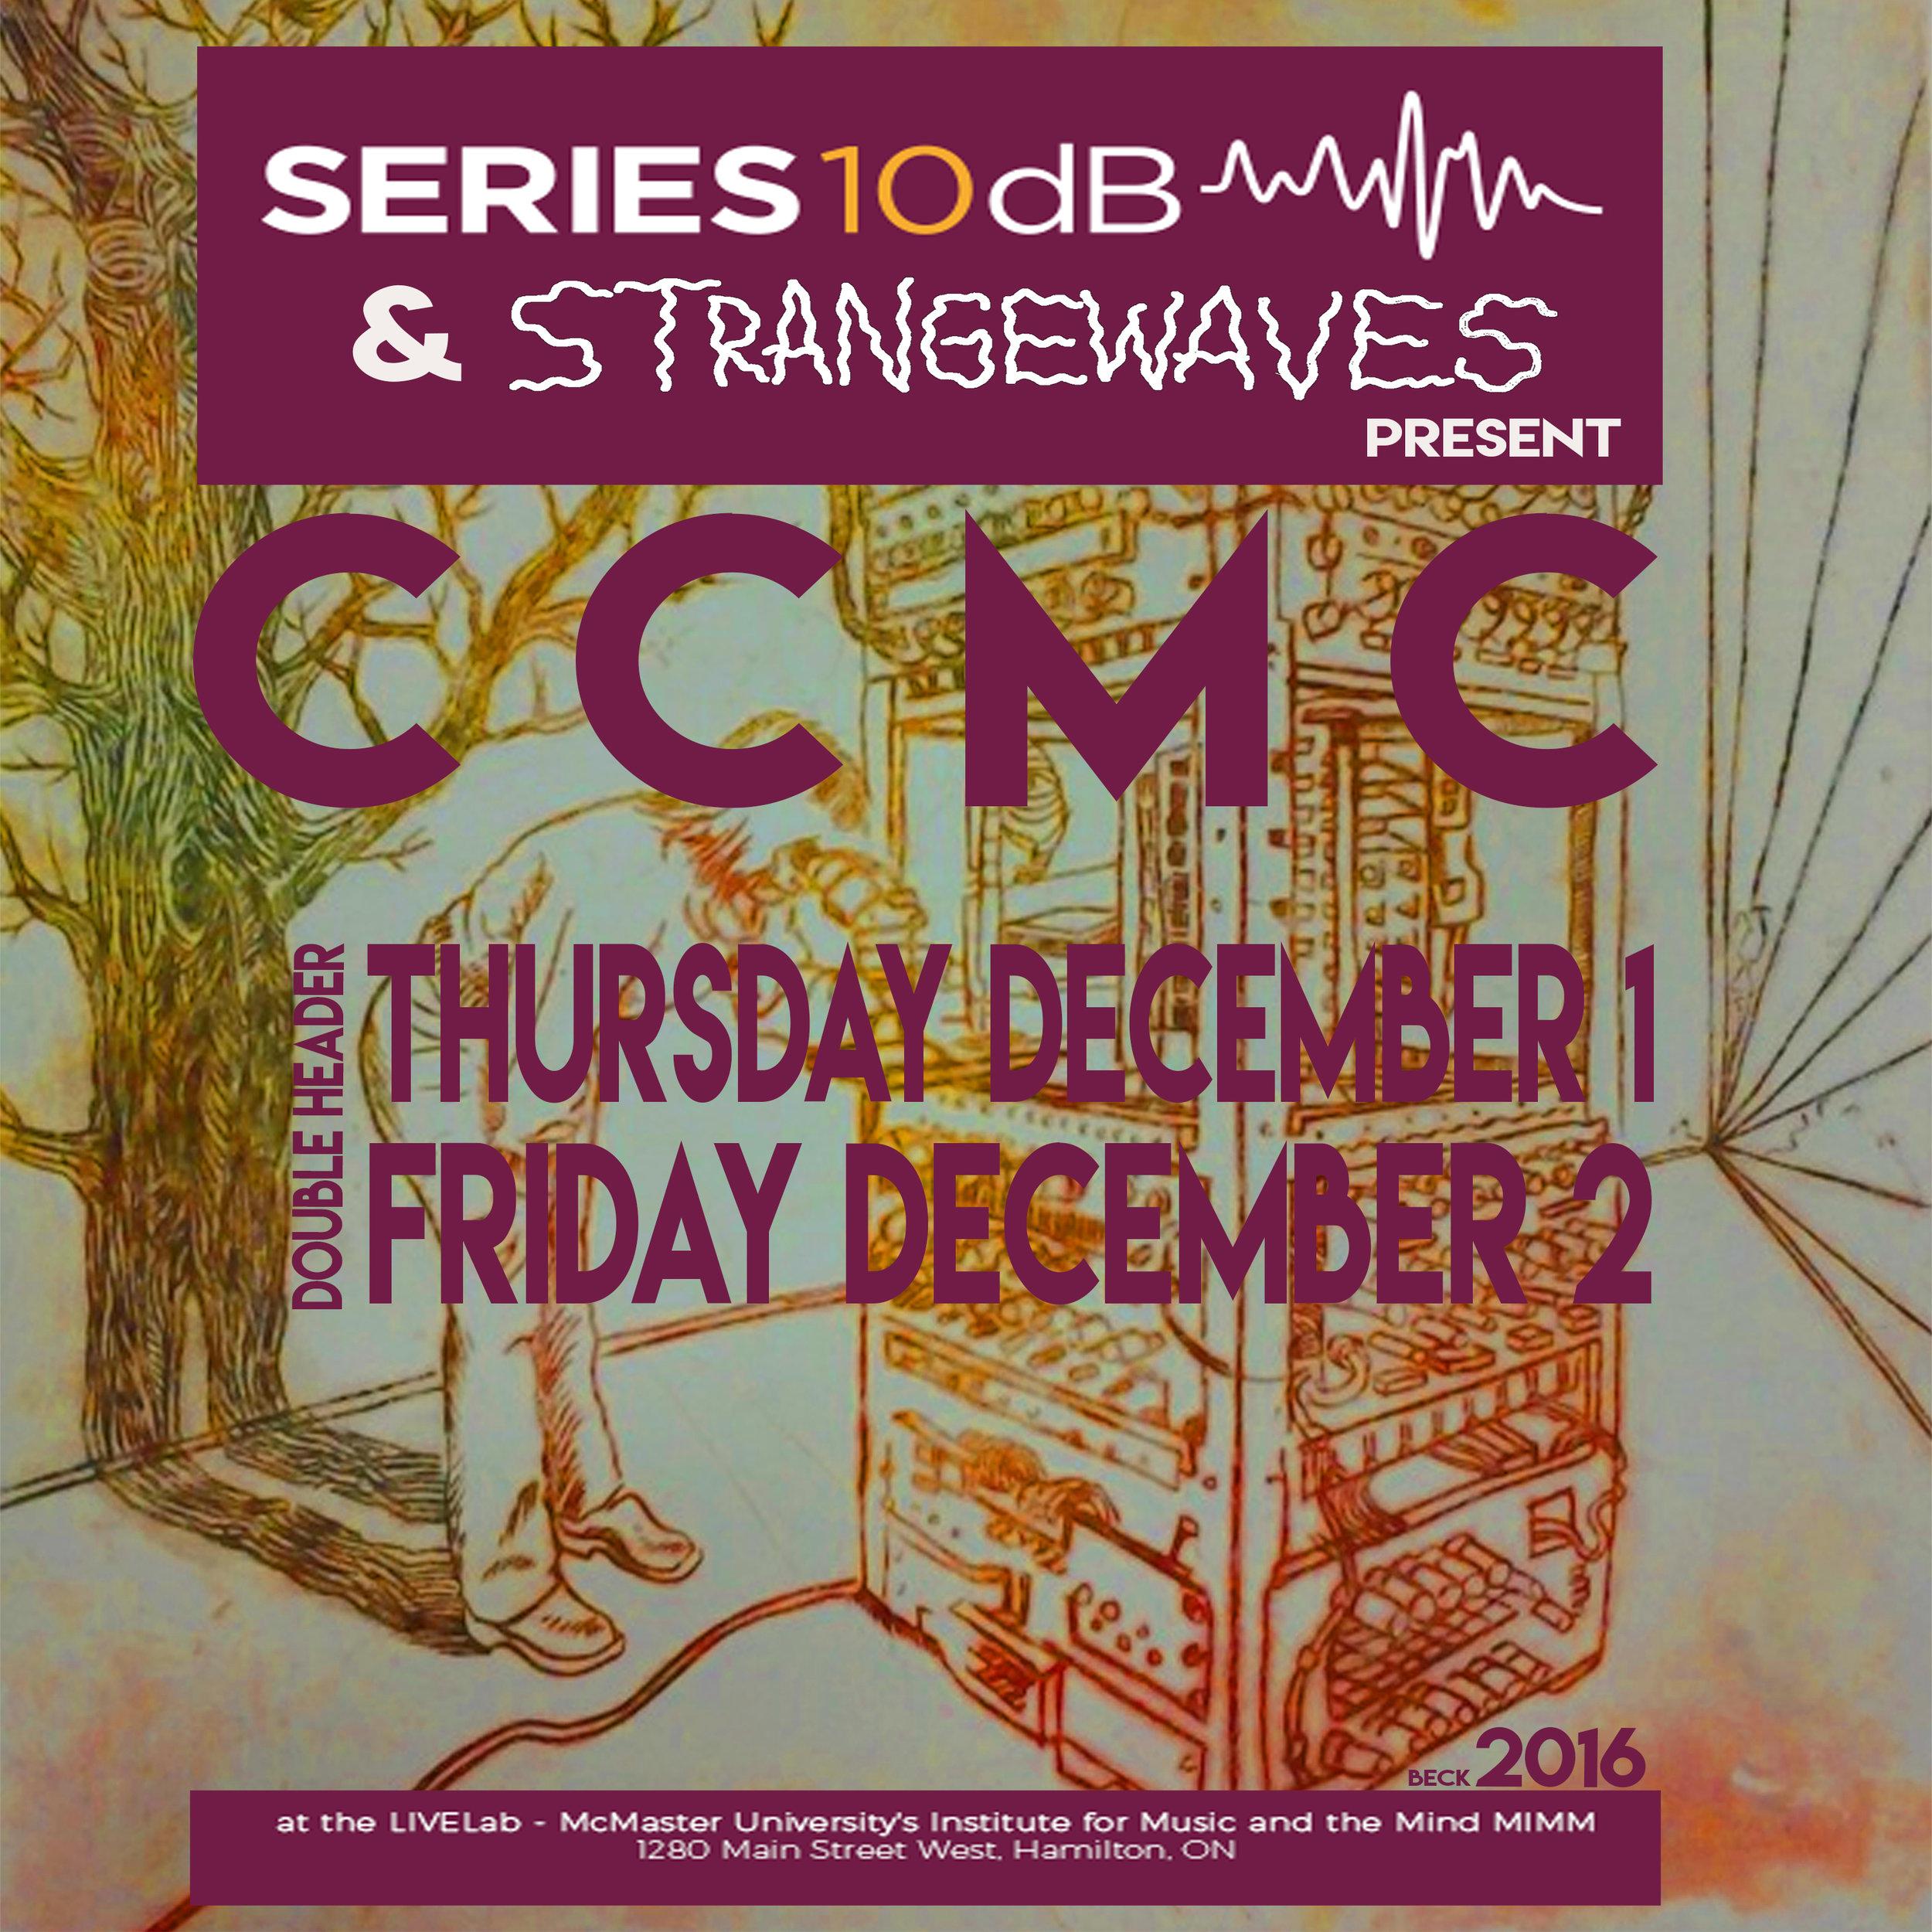 Series 10dB & Strangewaves present: CCMC  @McMaster LiveLab